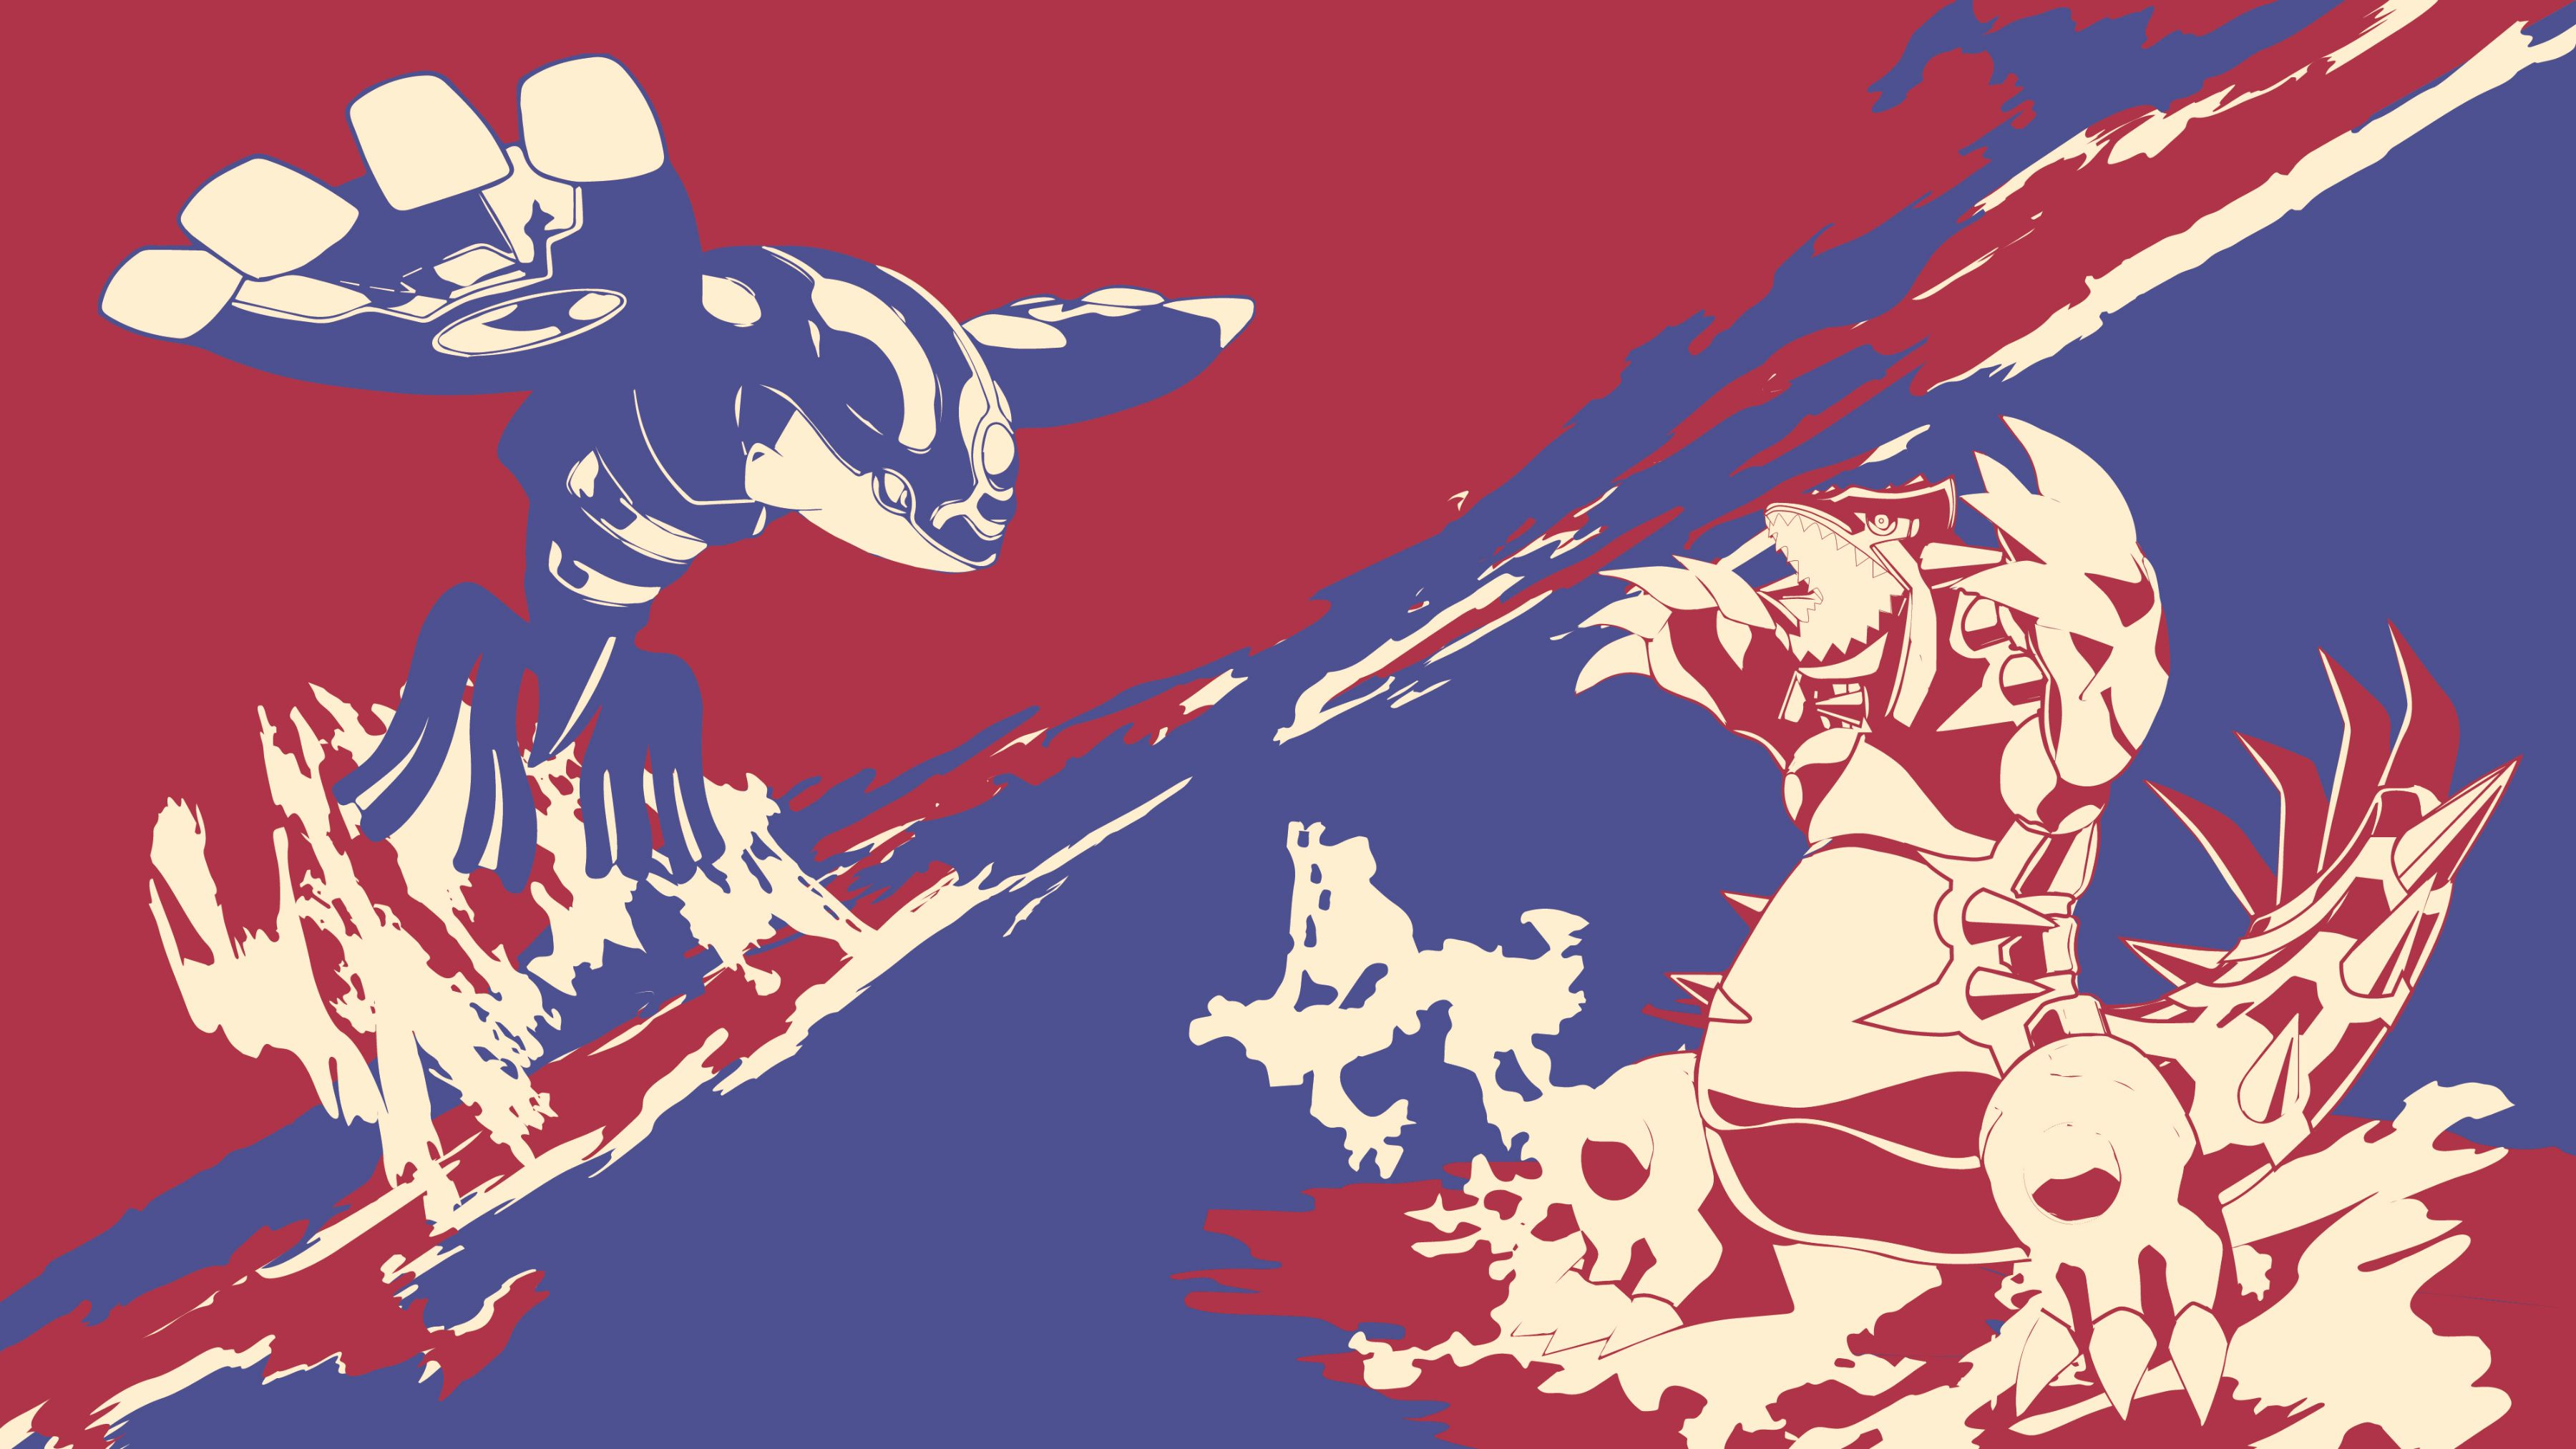 Red Pokemon Wallpaper - WallpaperSafari